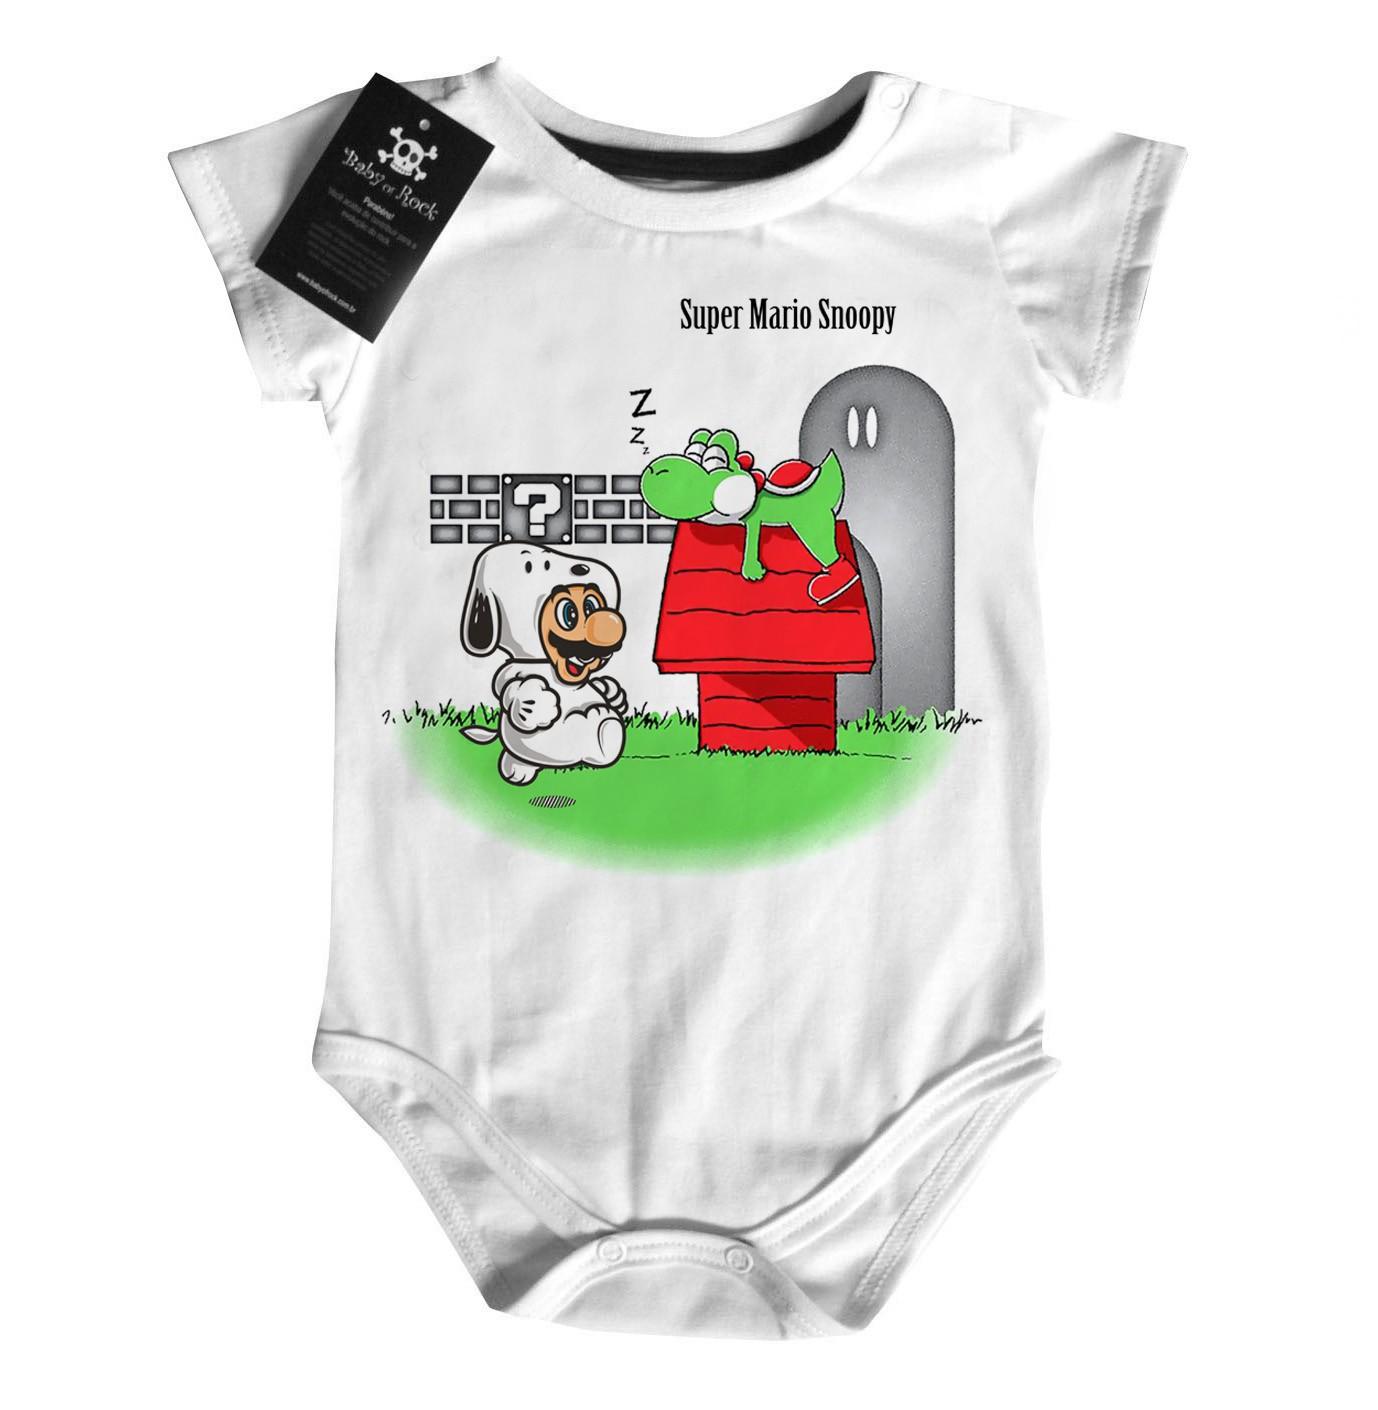 Body Bebe Game Mario Snoopy  - Baby Monster S/A